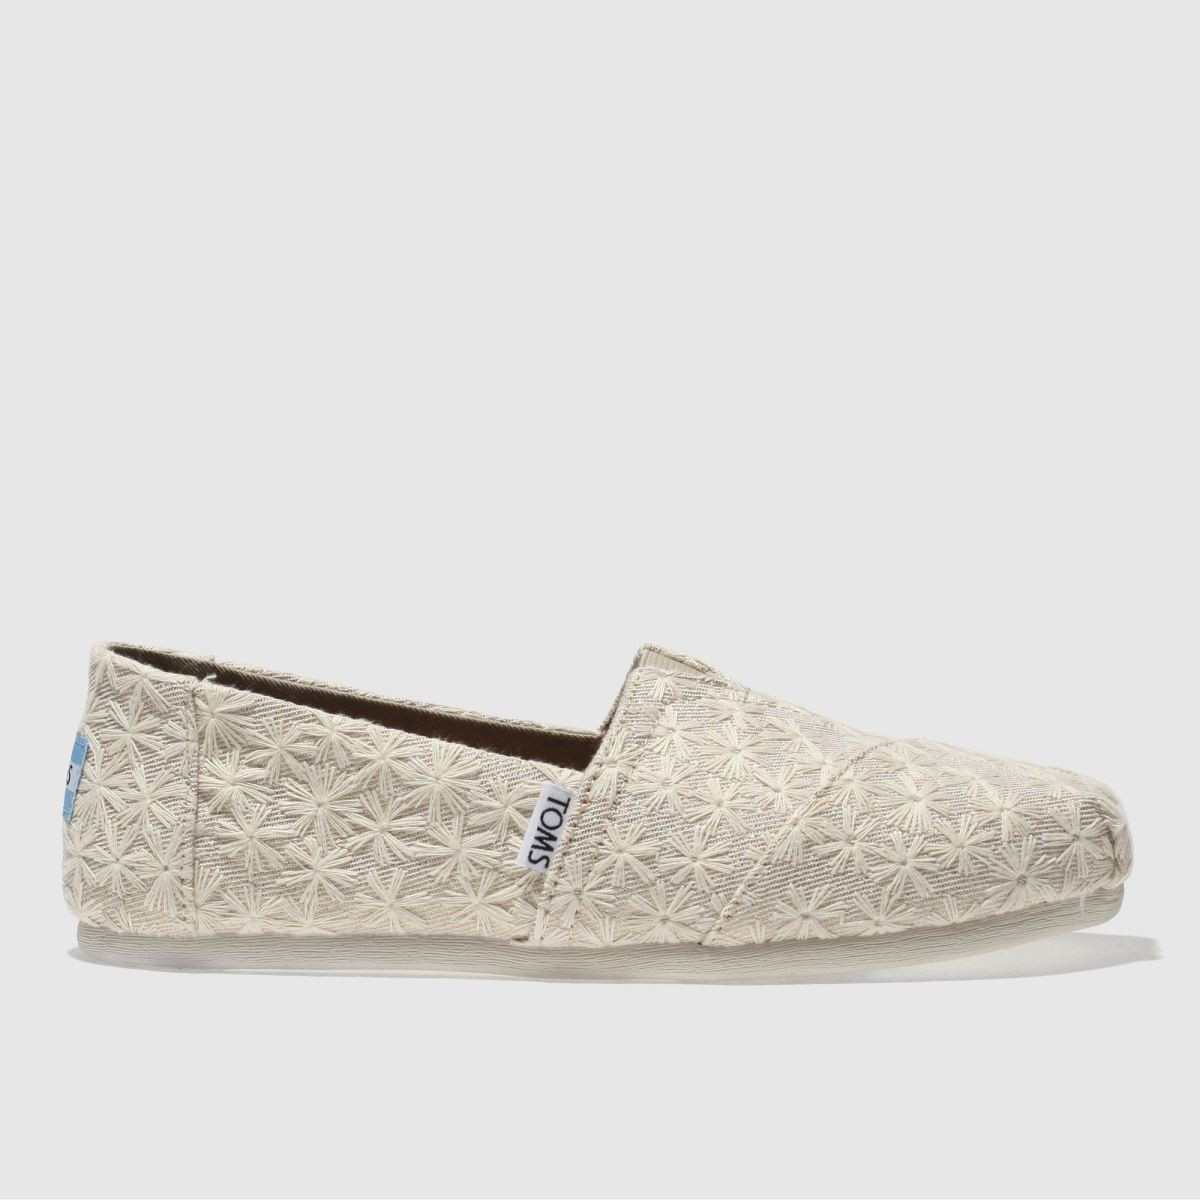 Toms Natural Alpargata Flat Shoes